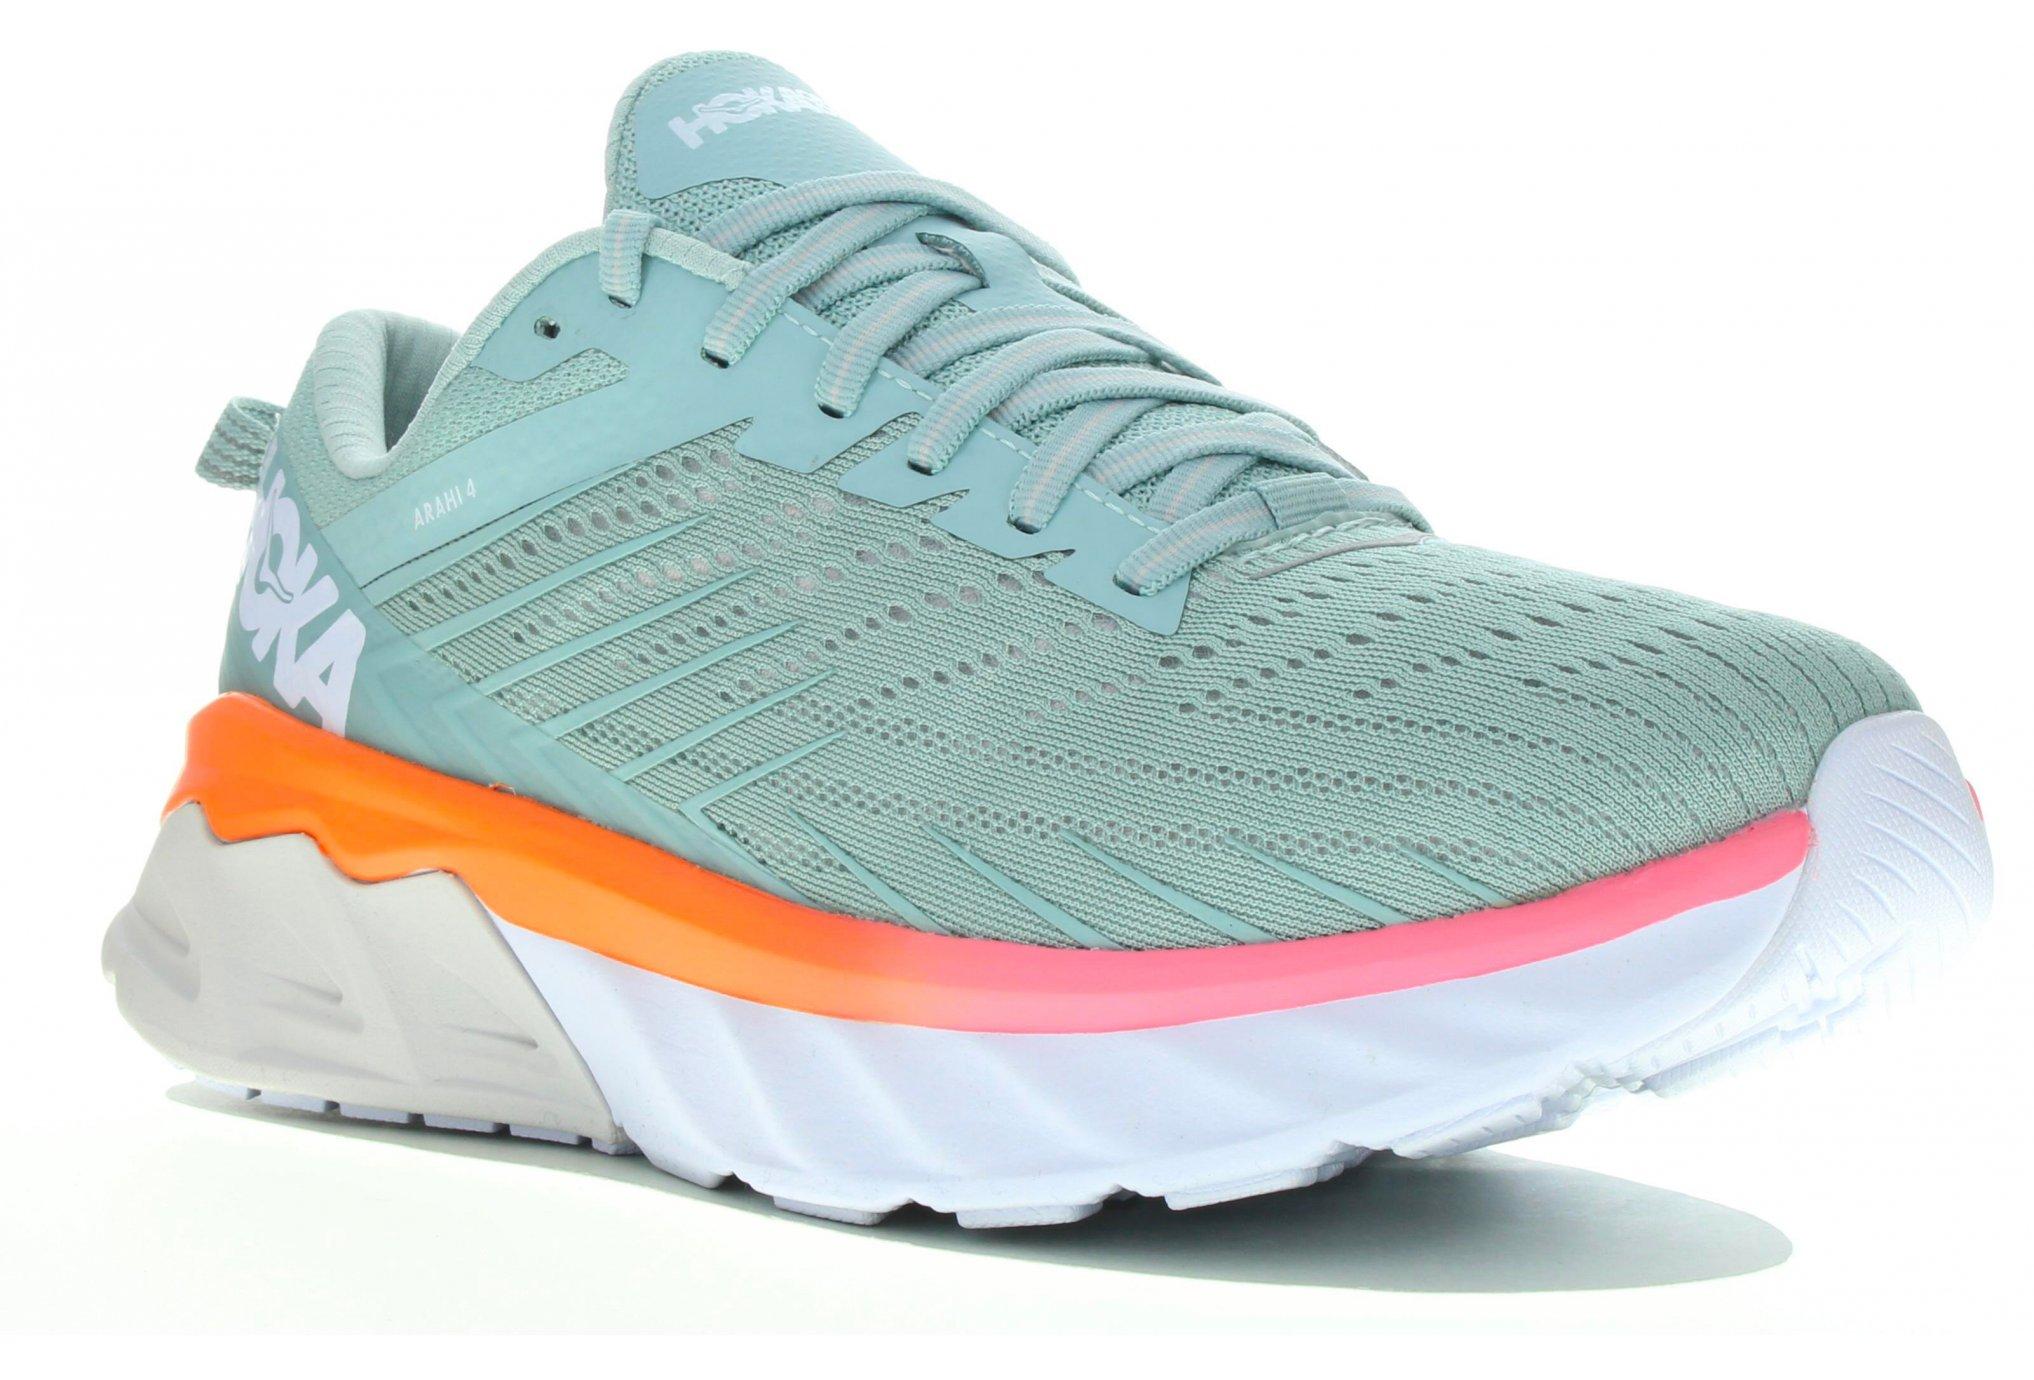 Hoka One One Arahi 4 Chaussures running femme